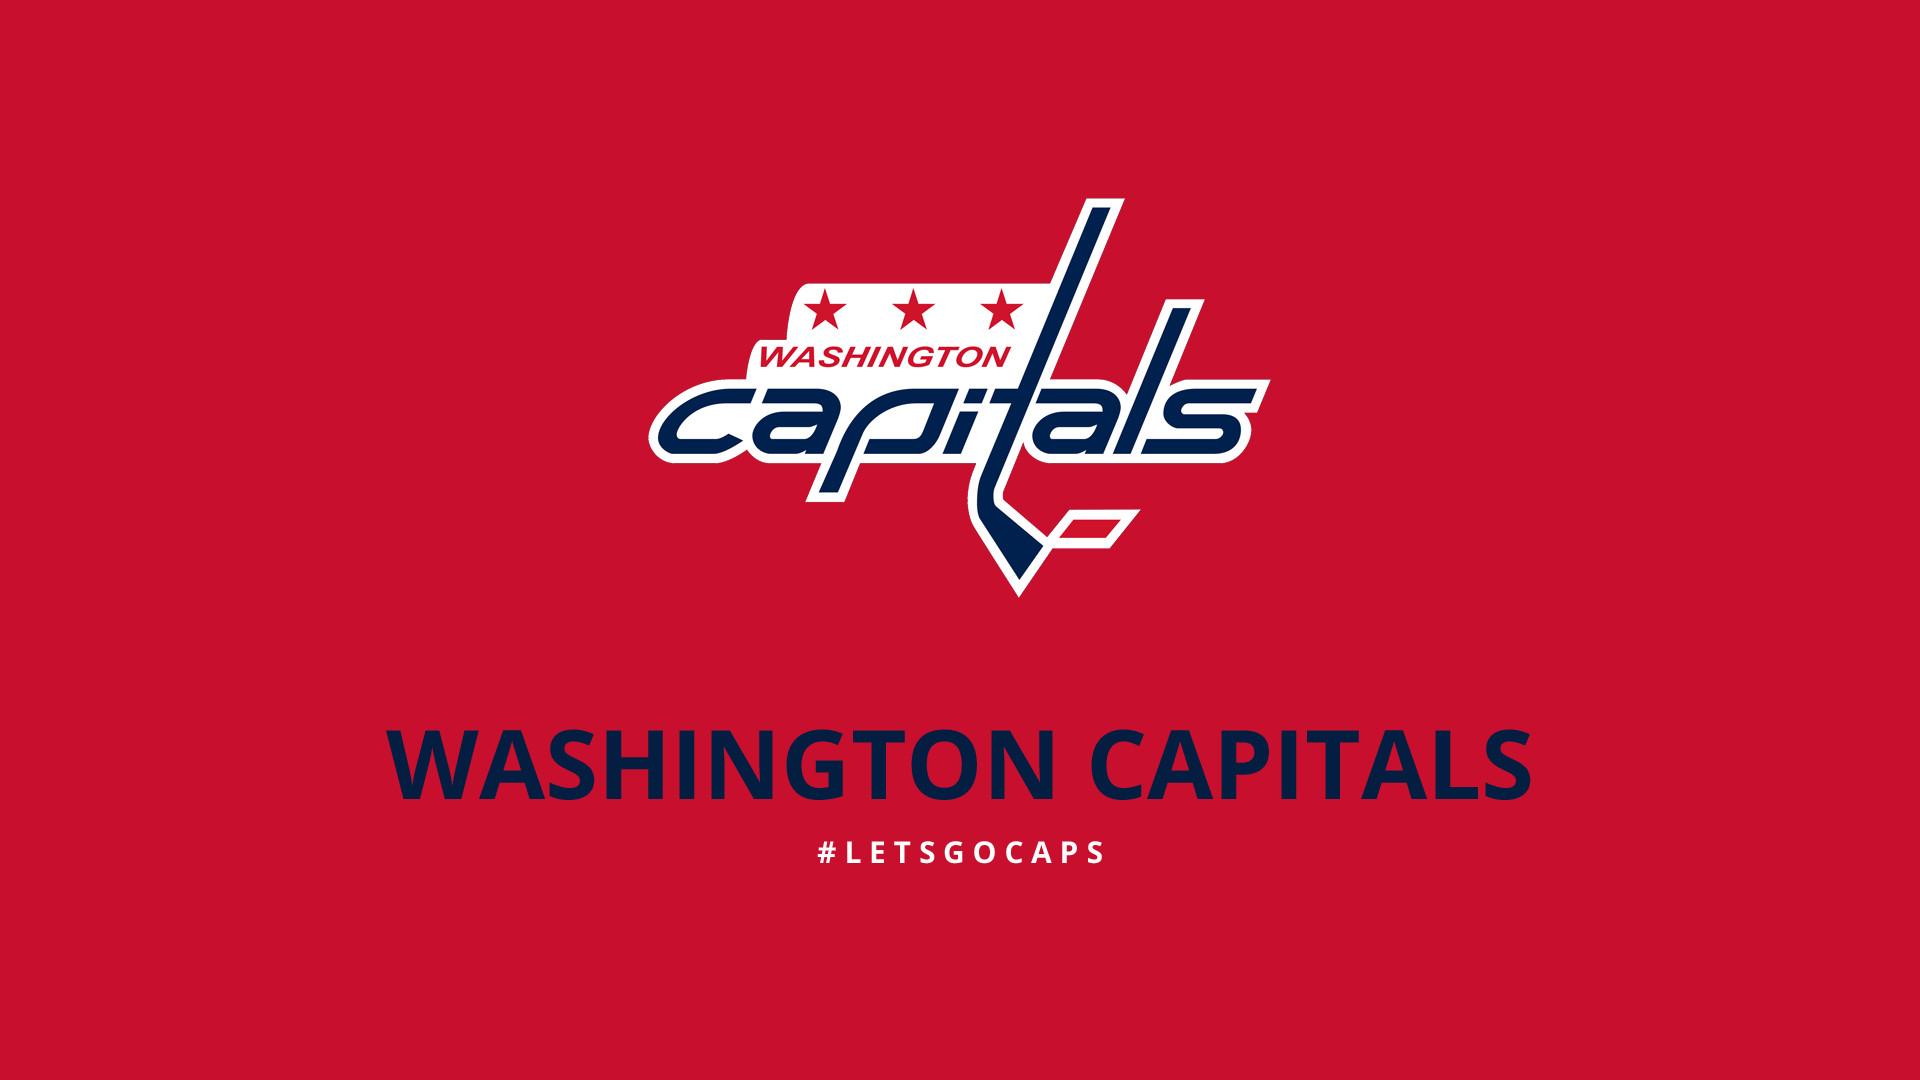 Minimalist Washington Capitals wallpaper by lfiore on DeviantArt